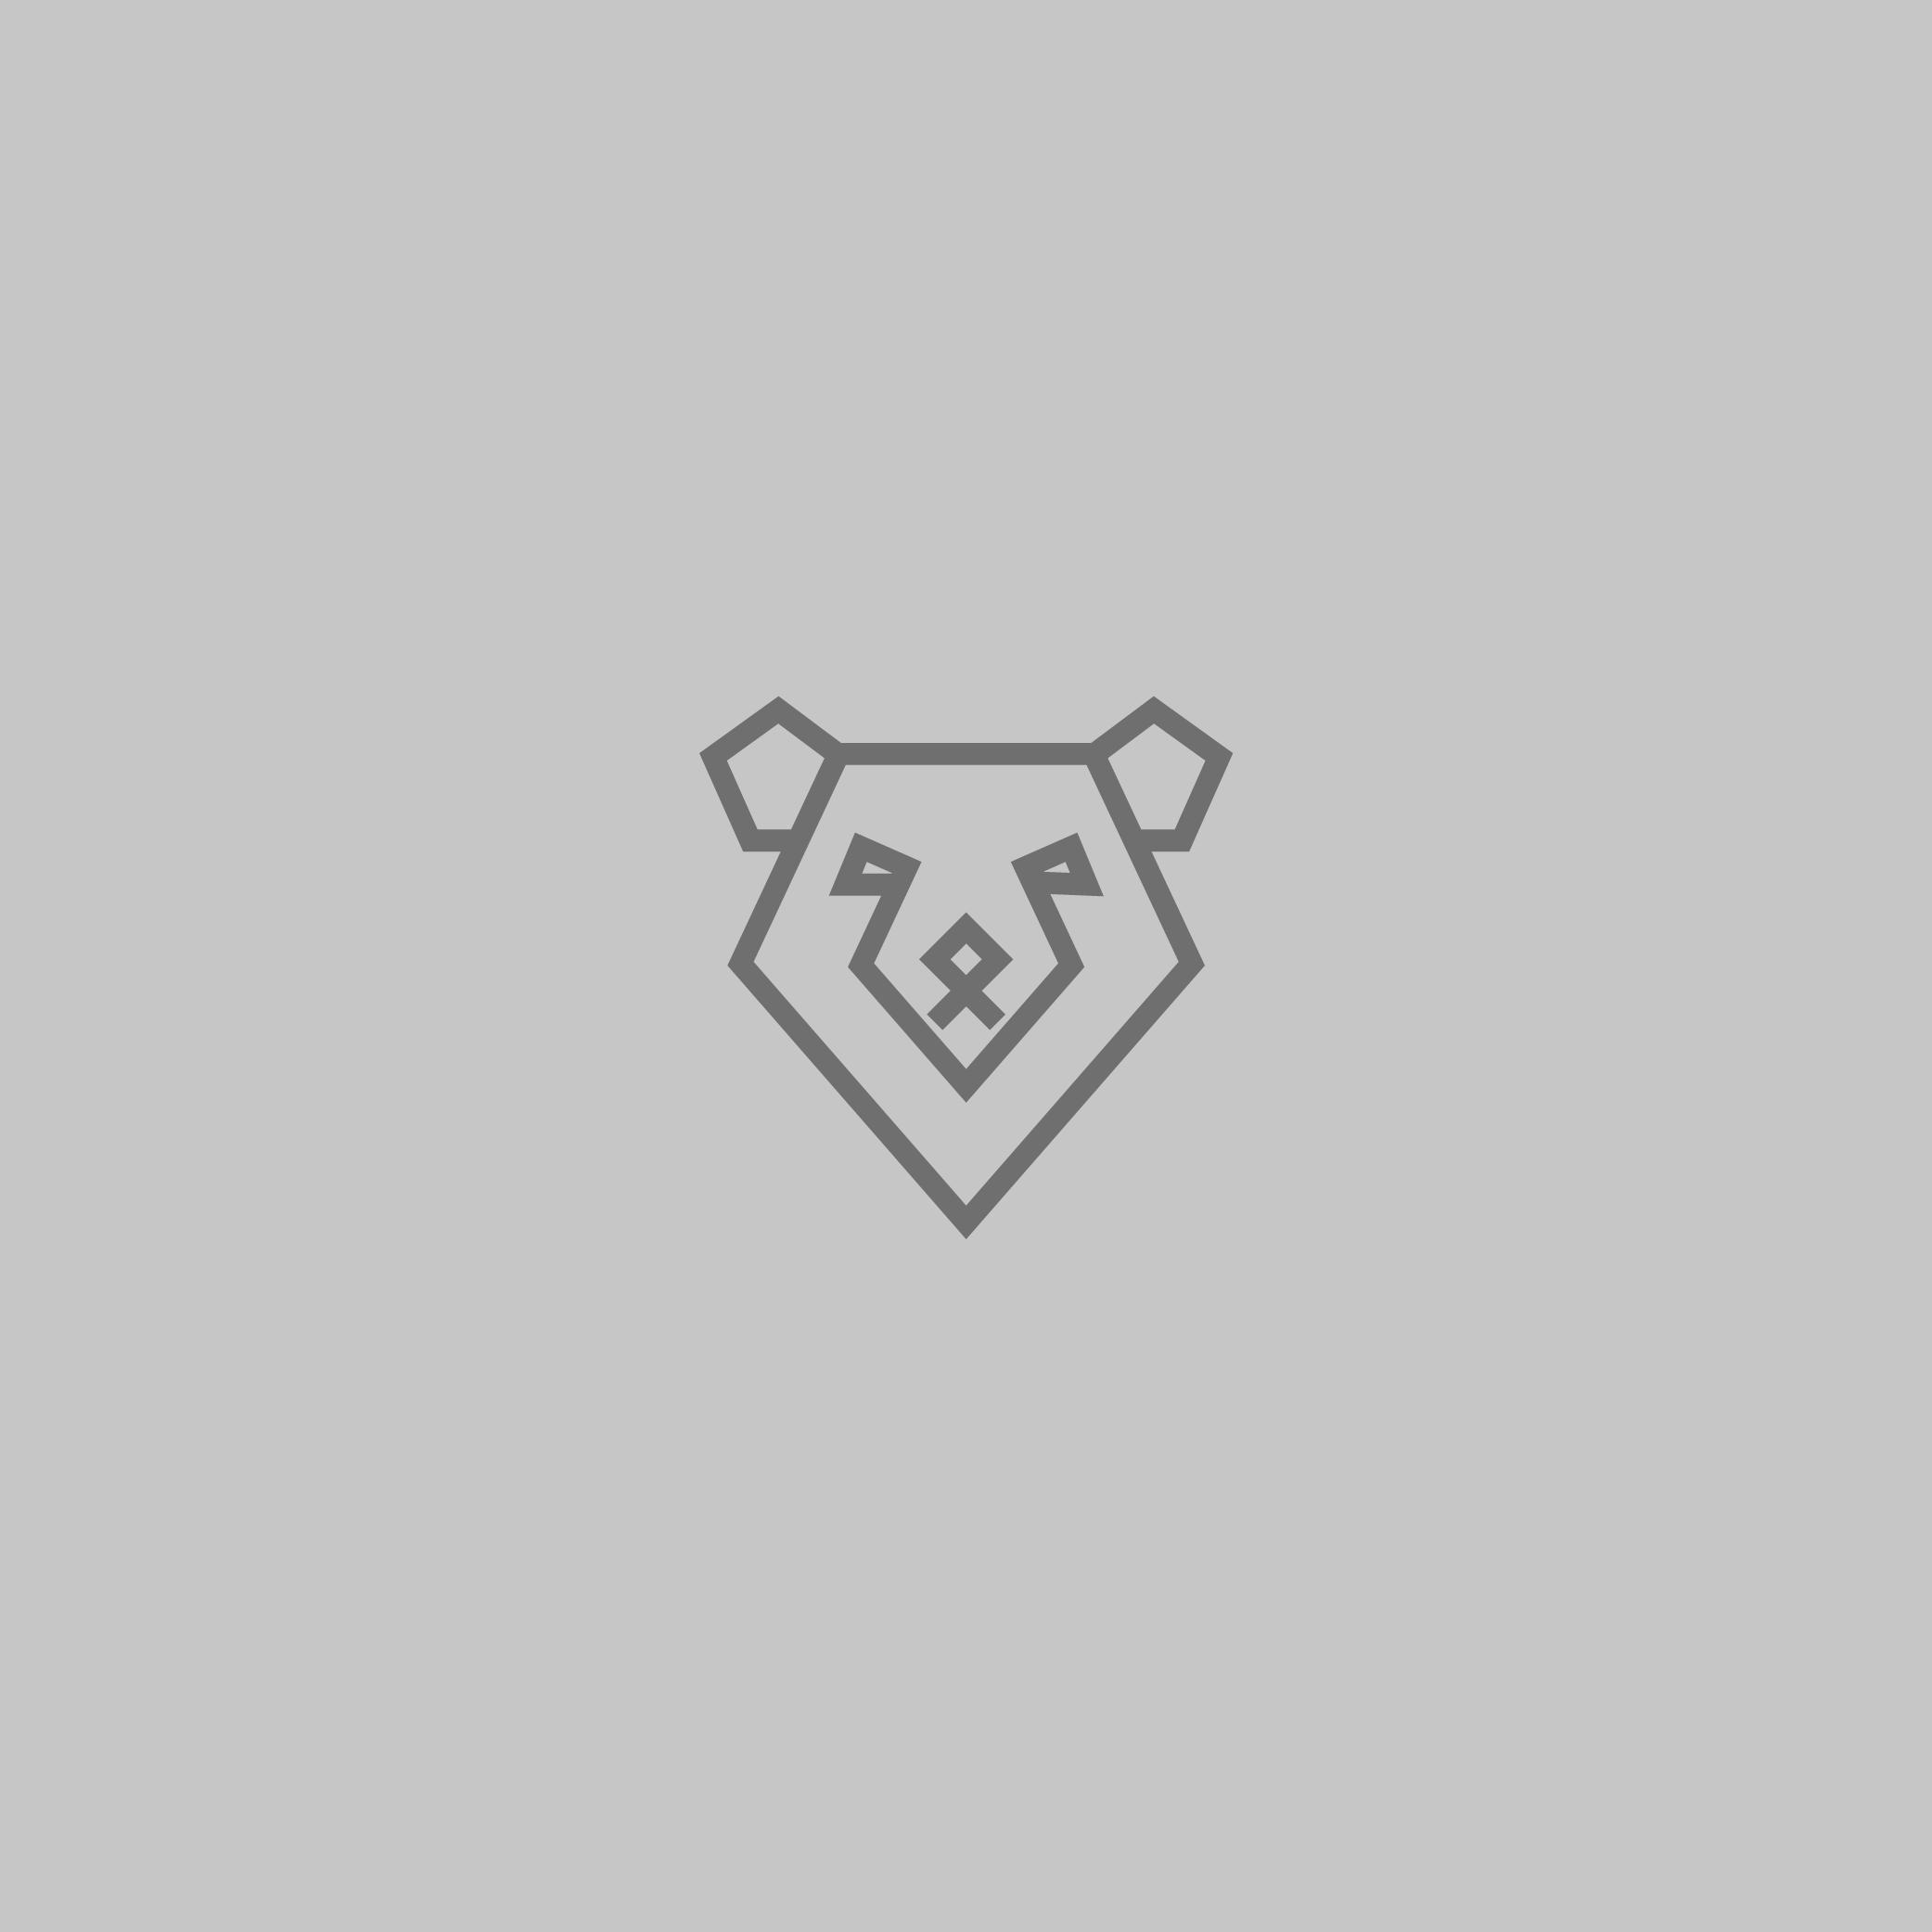 Bear Line-01.png